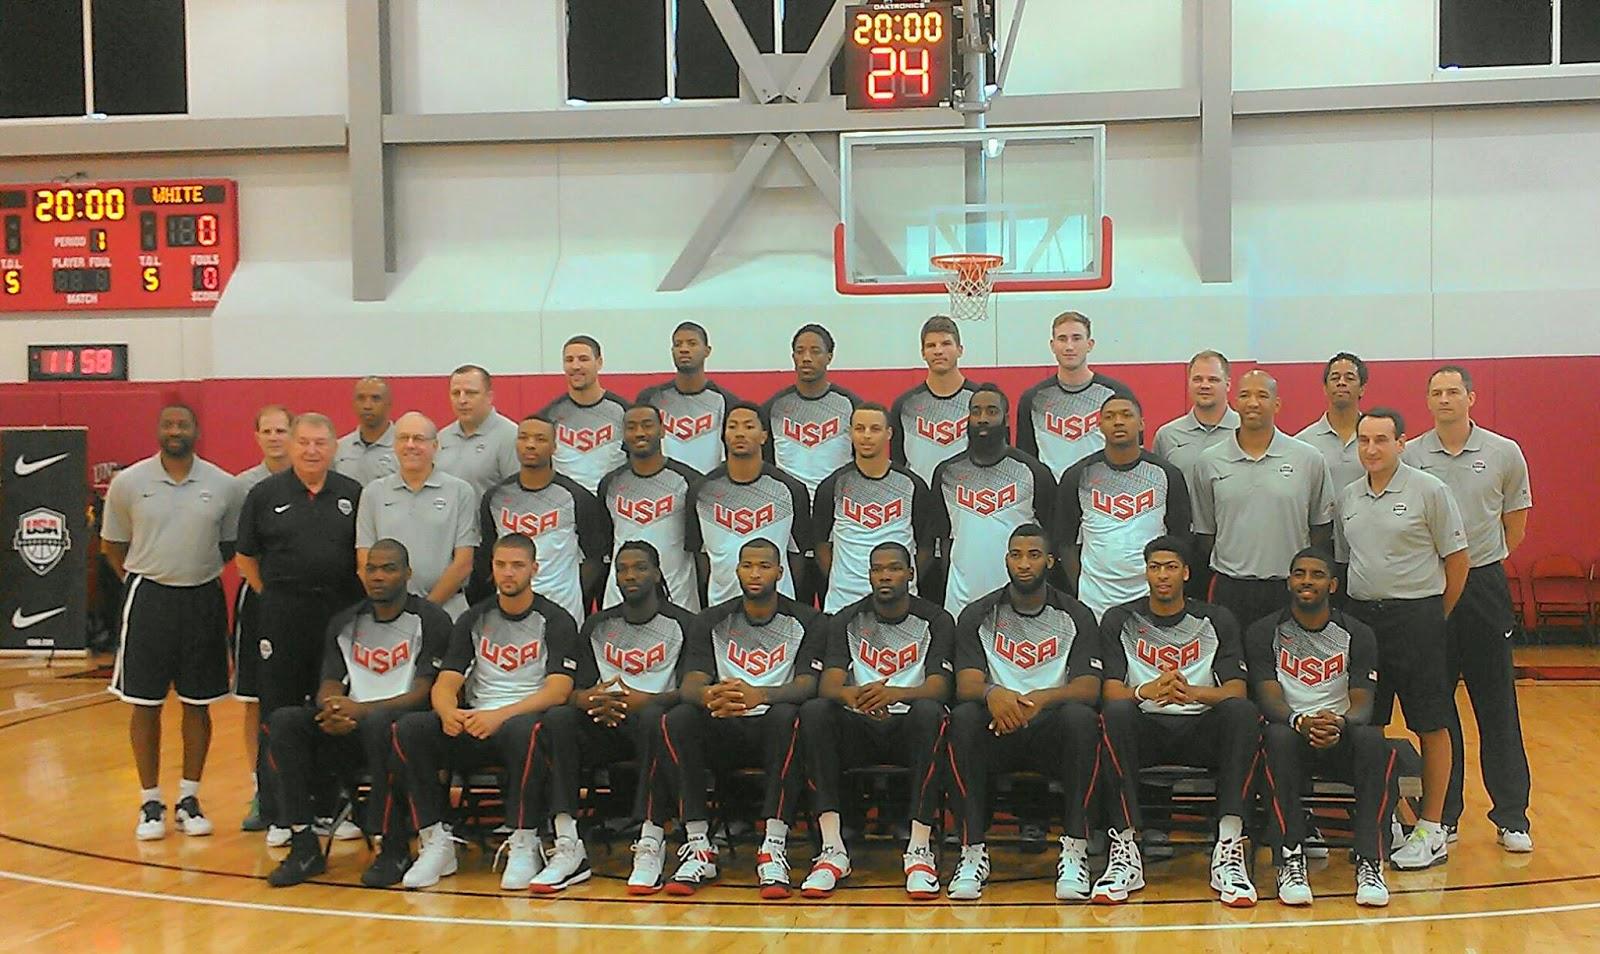 ¿Cuánto mide Derrick Rose? - Altura - Real height 2014+USA+Men%27s+Basketball+National+Team